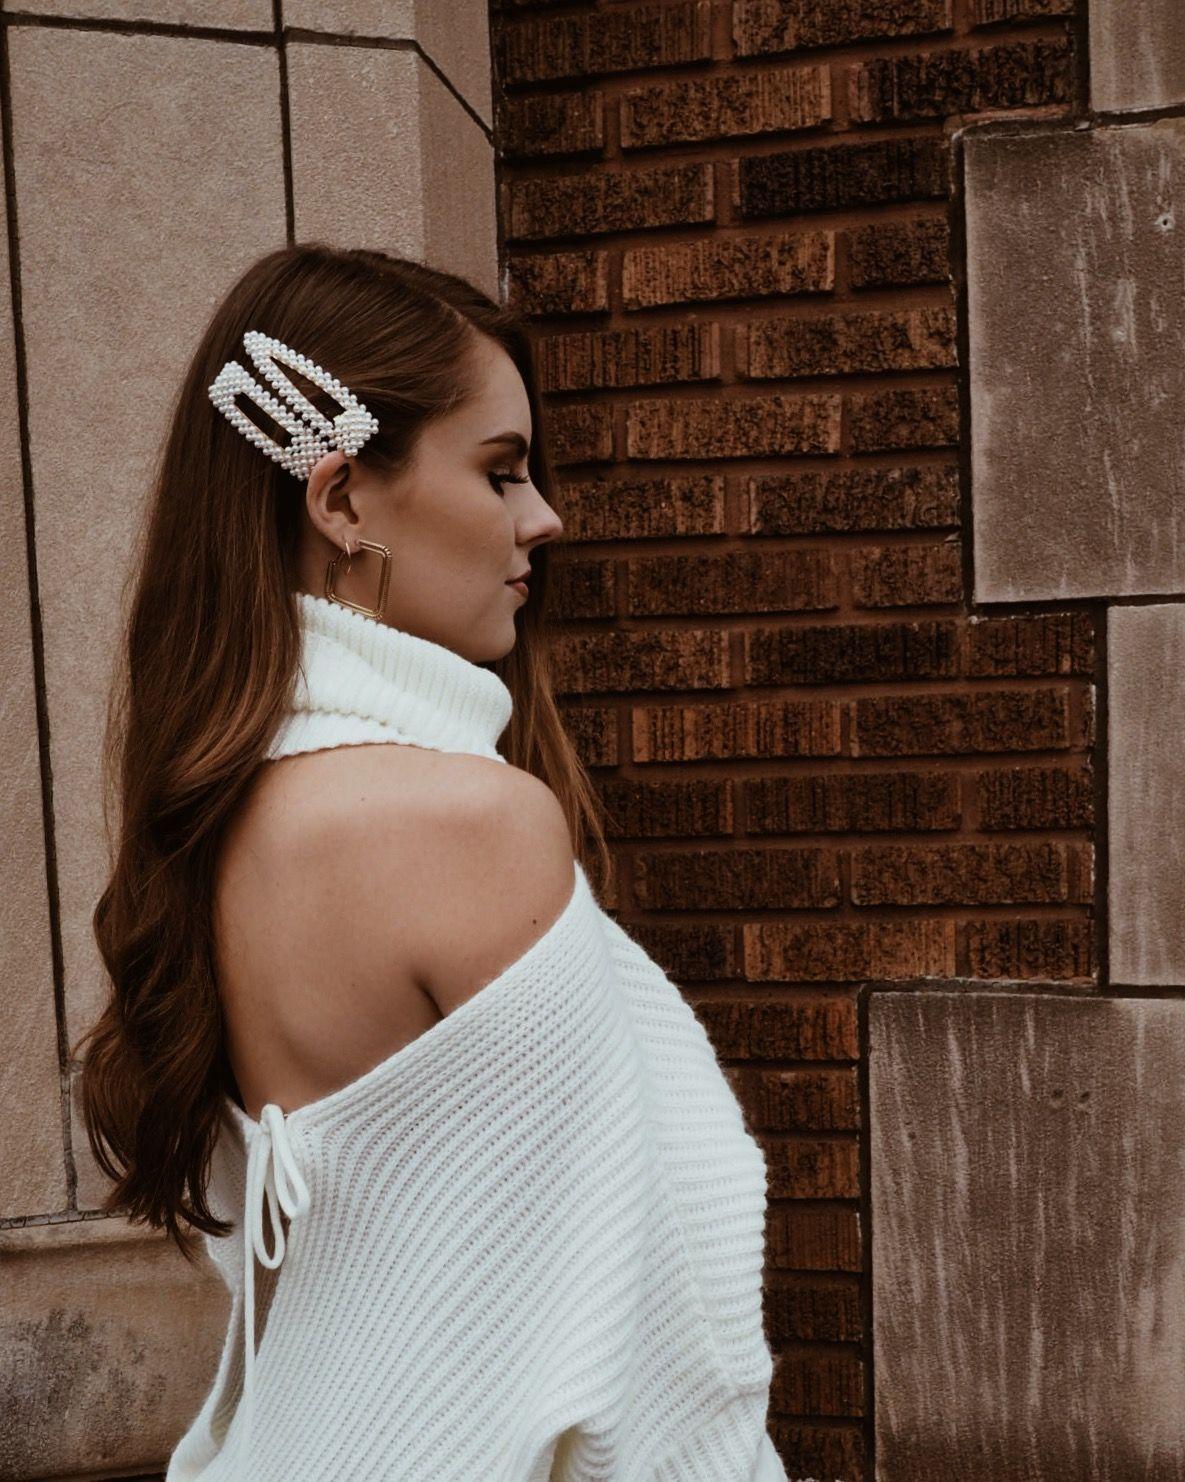 Pearl hair clip hairstyle #blogger #hairstyle #ootd #inspo #hairgoals #hairinspo